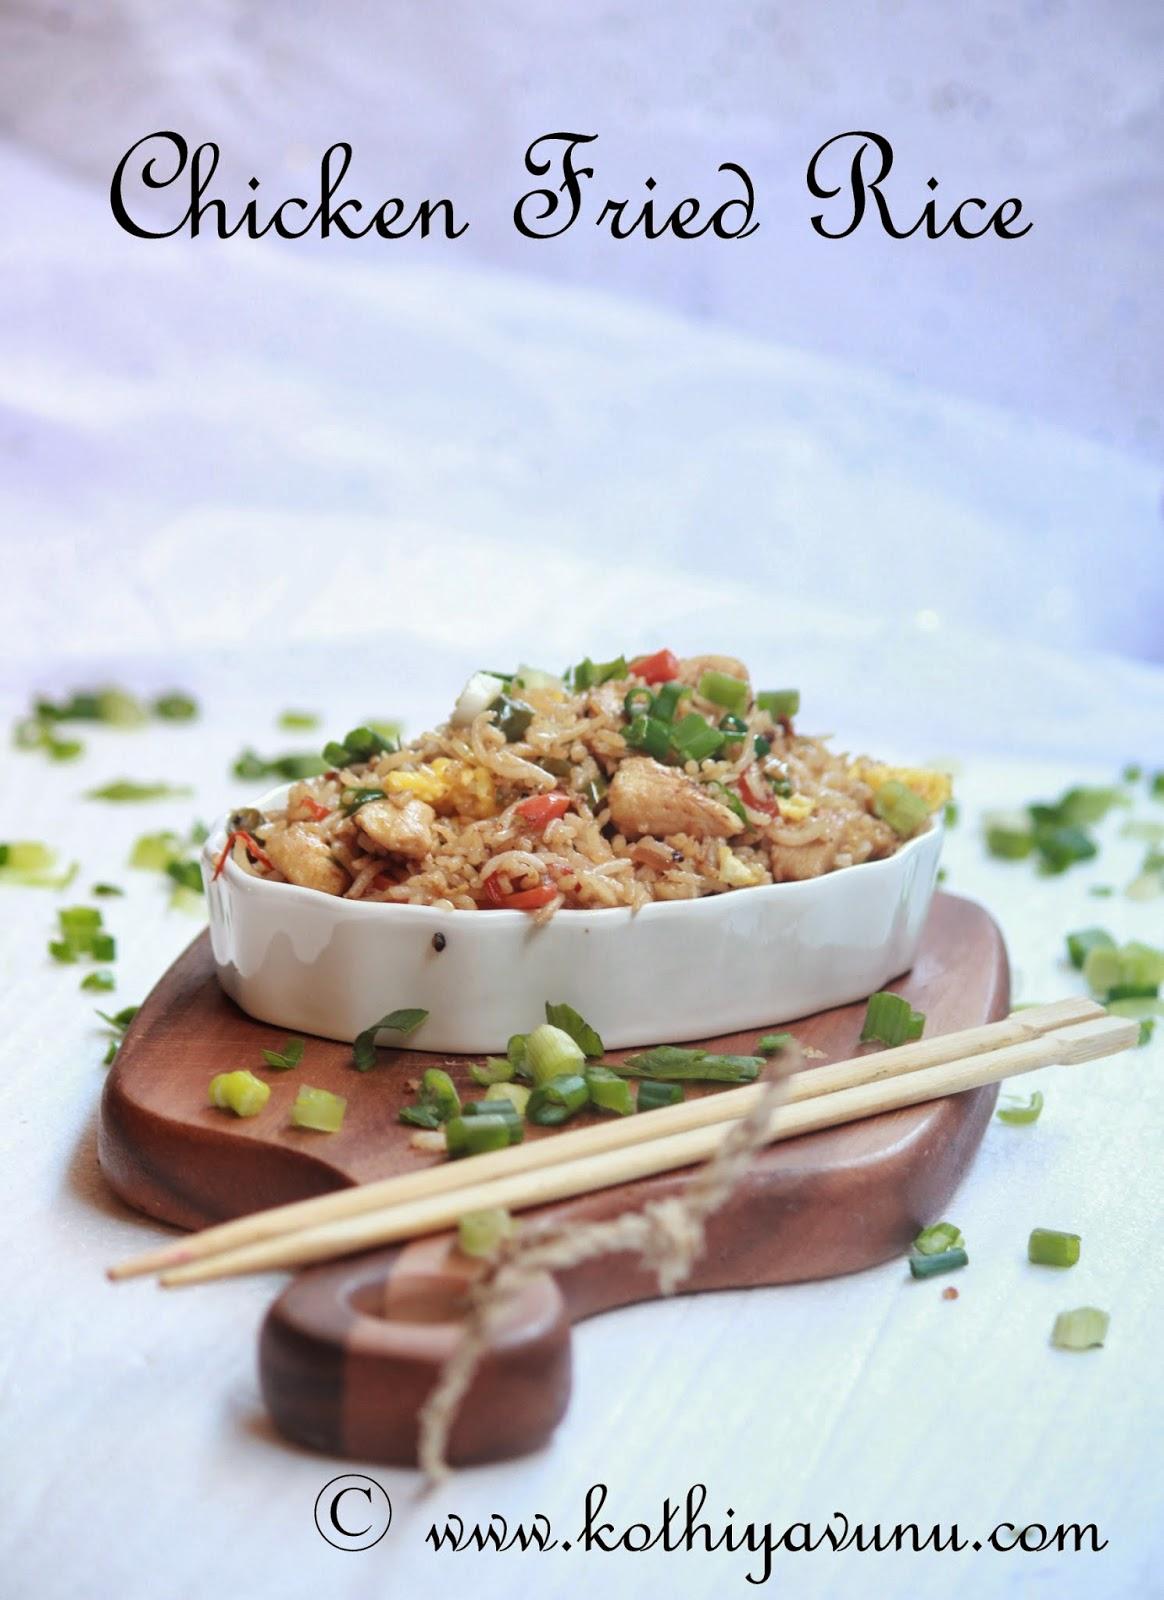 Chicken fried rice recipe kothiyavunu ccuart Image collections